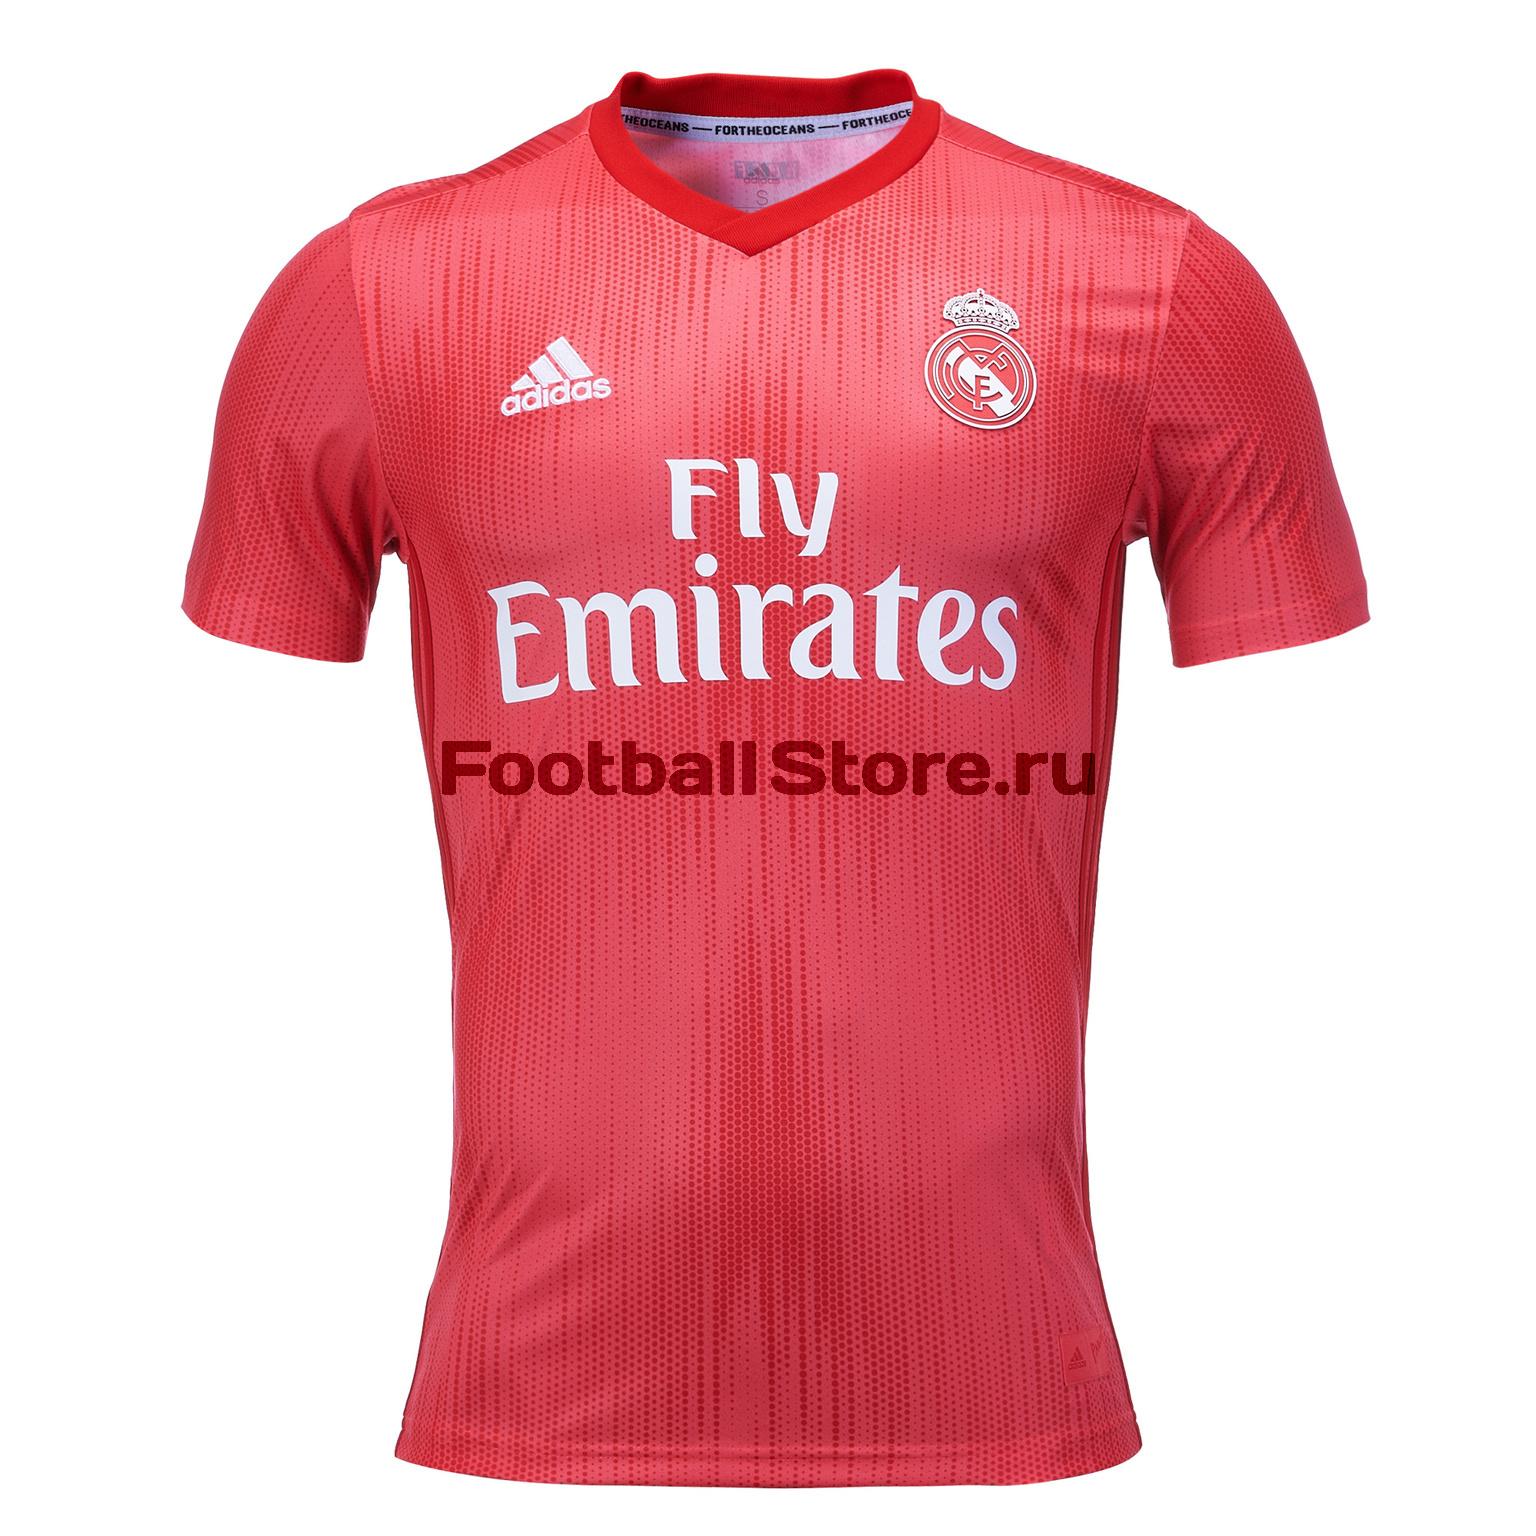 Футболка резервная Adidas Real Madrid 2018/19